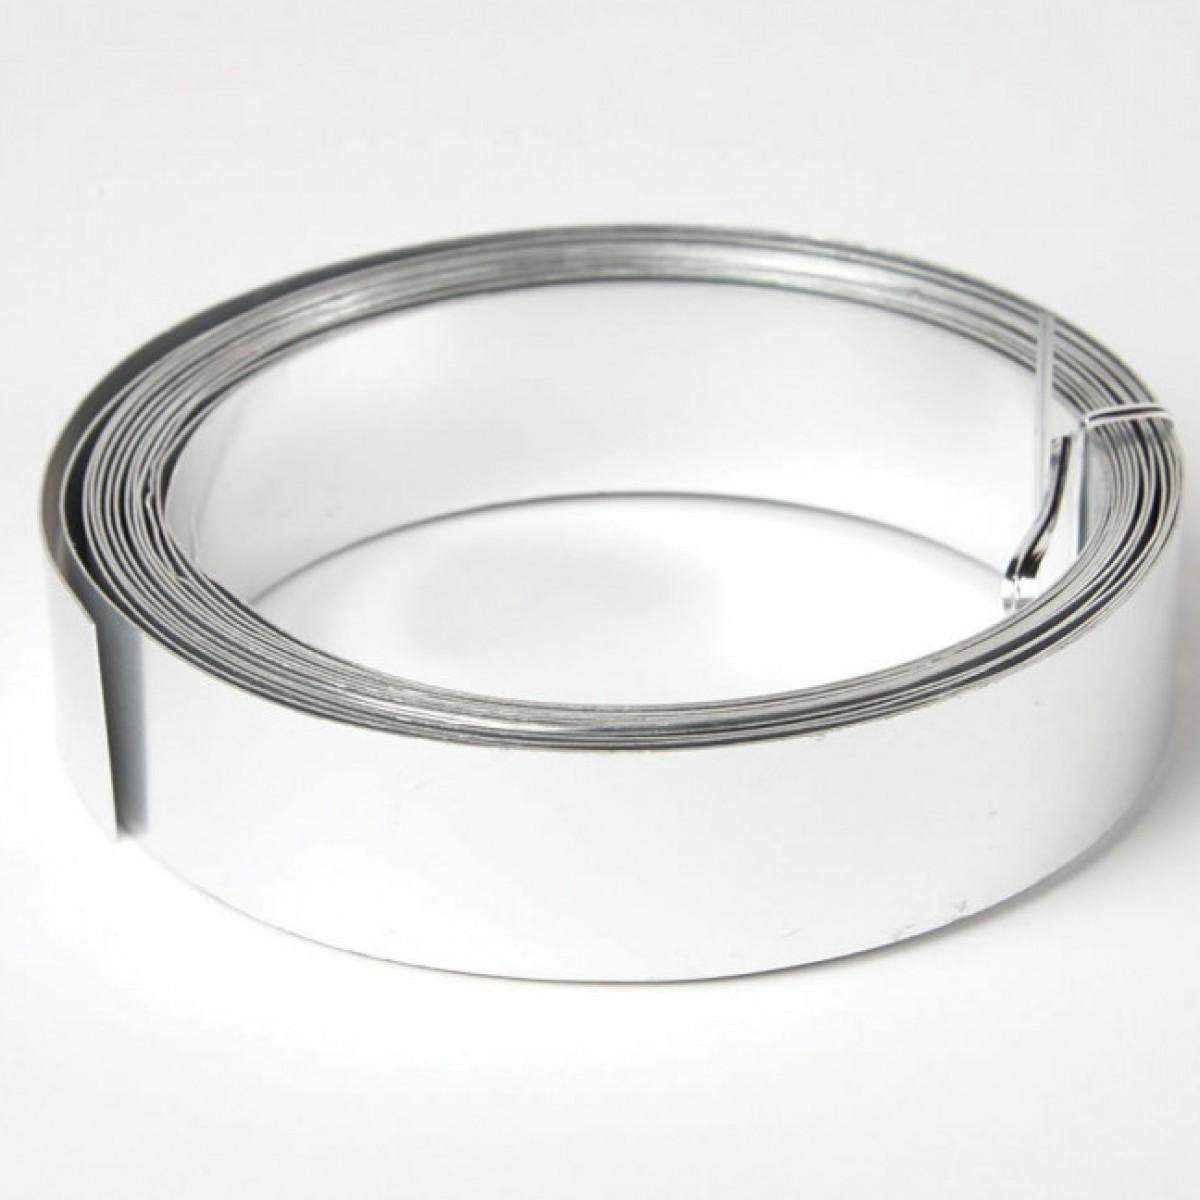 Flat Aluminium Wire Silver 30mmx0.5mmx5m 1 No